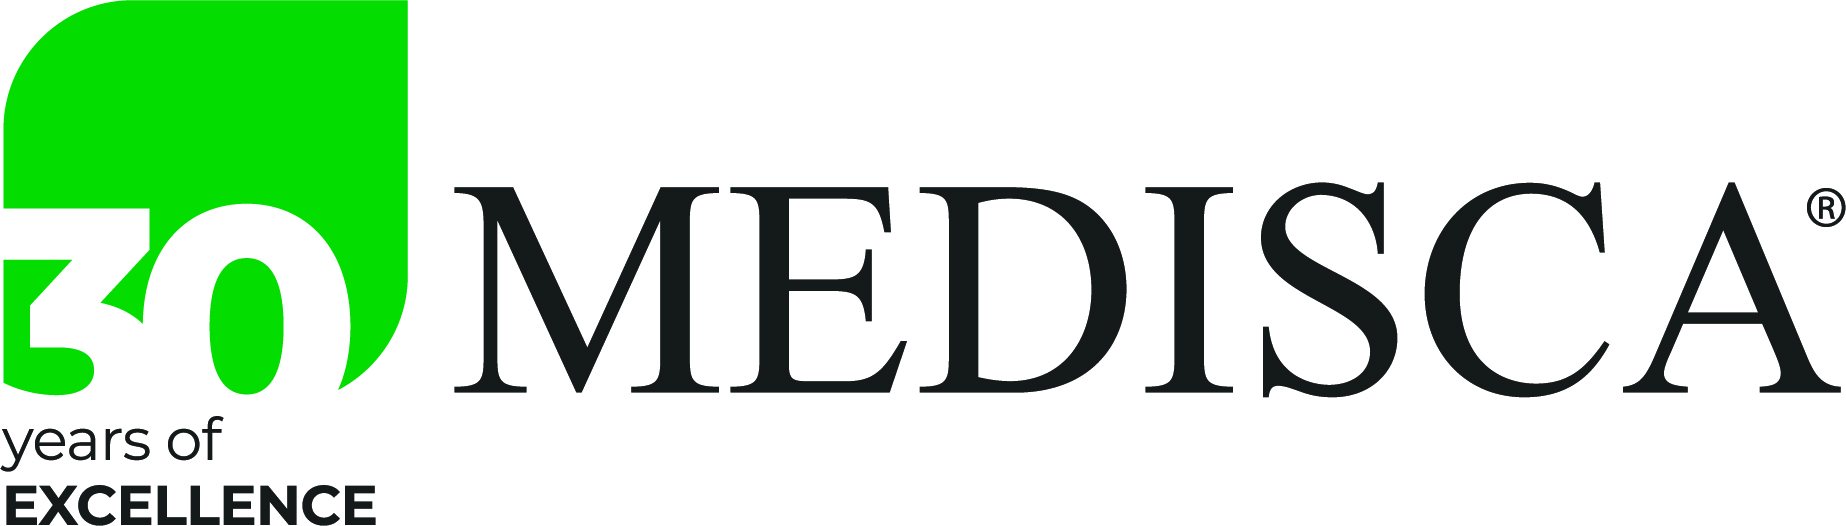 MEDISCA